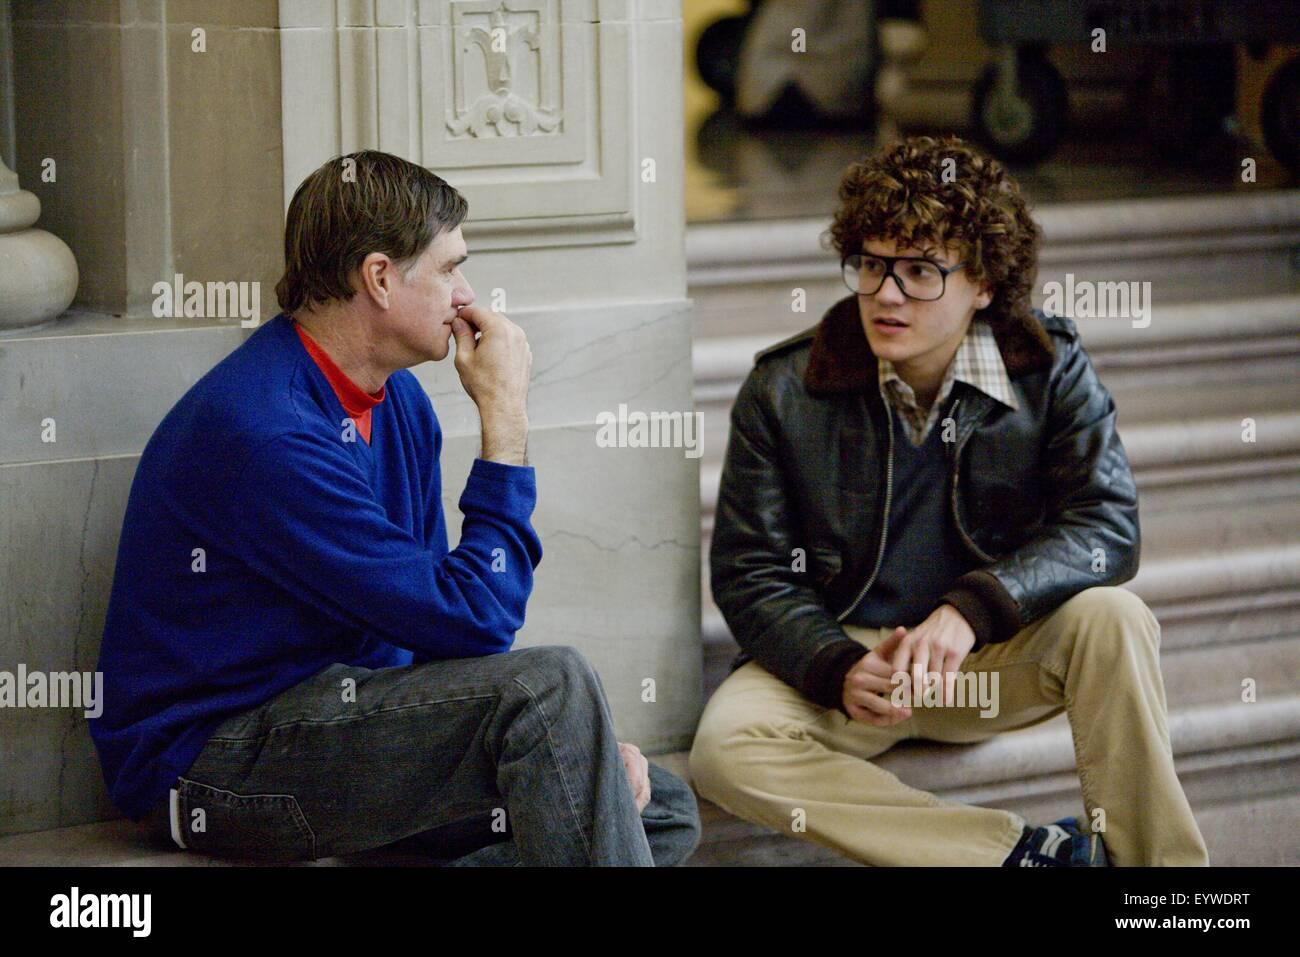 Milk Year : 2008 USA Director : Gus van Sant Gus van Sant, Emile Hirsch Shooting picture - Stock Image